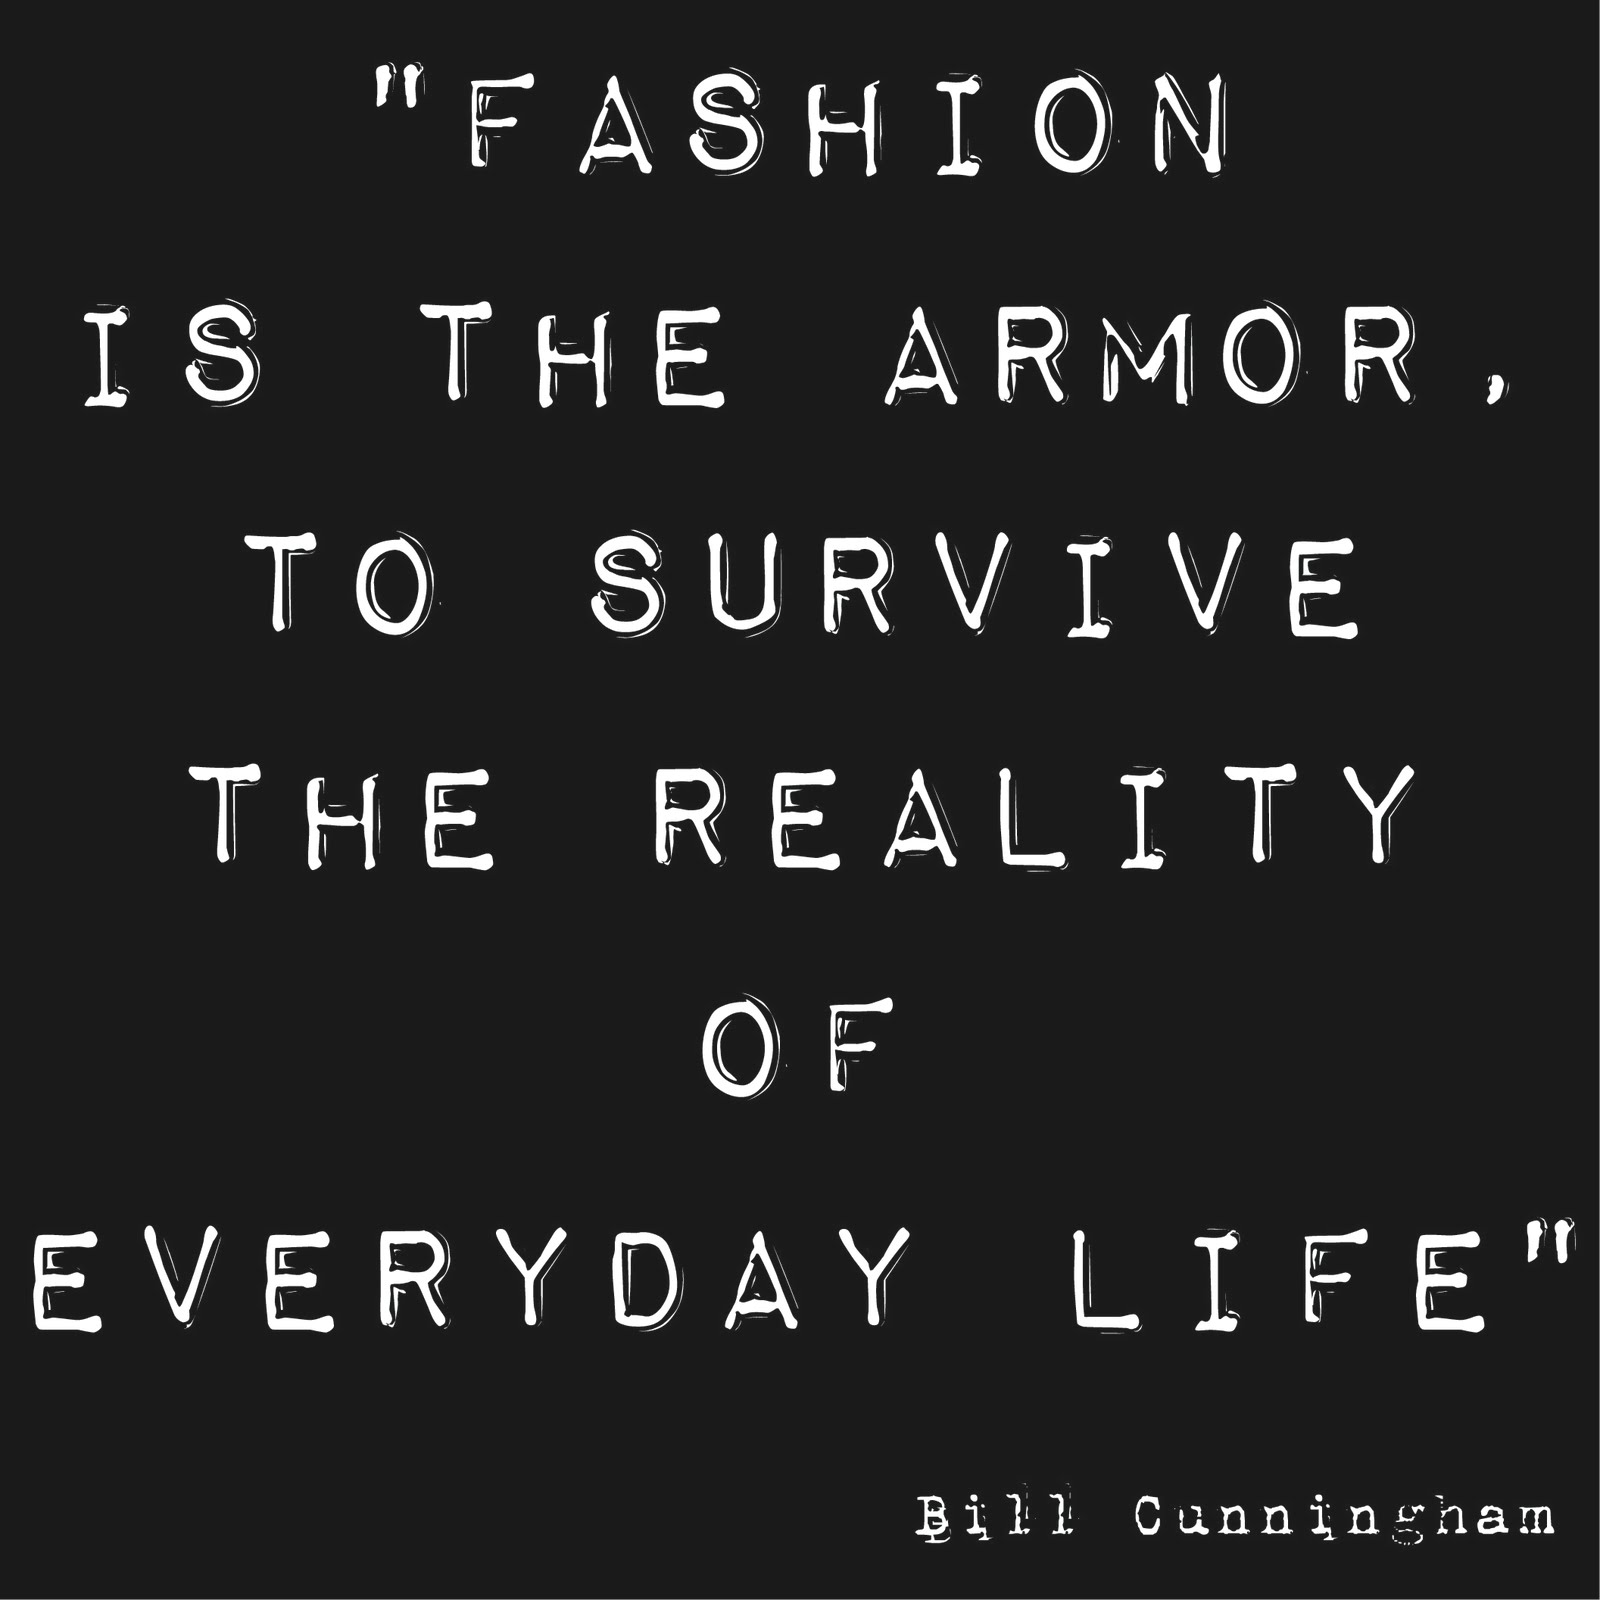 Bill Cunningham's quote #3